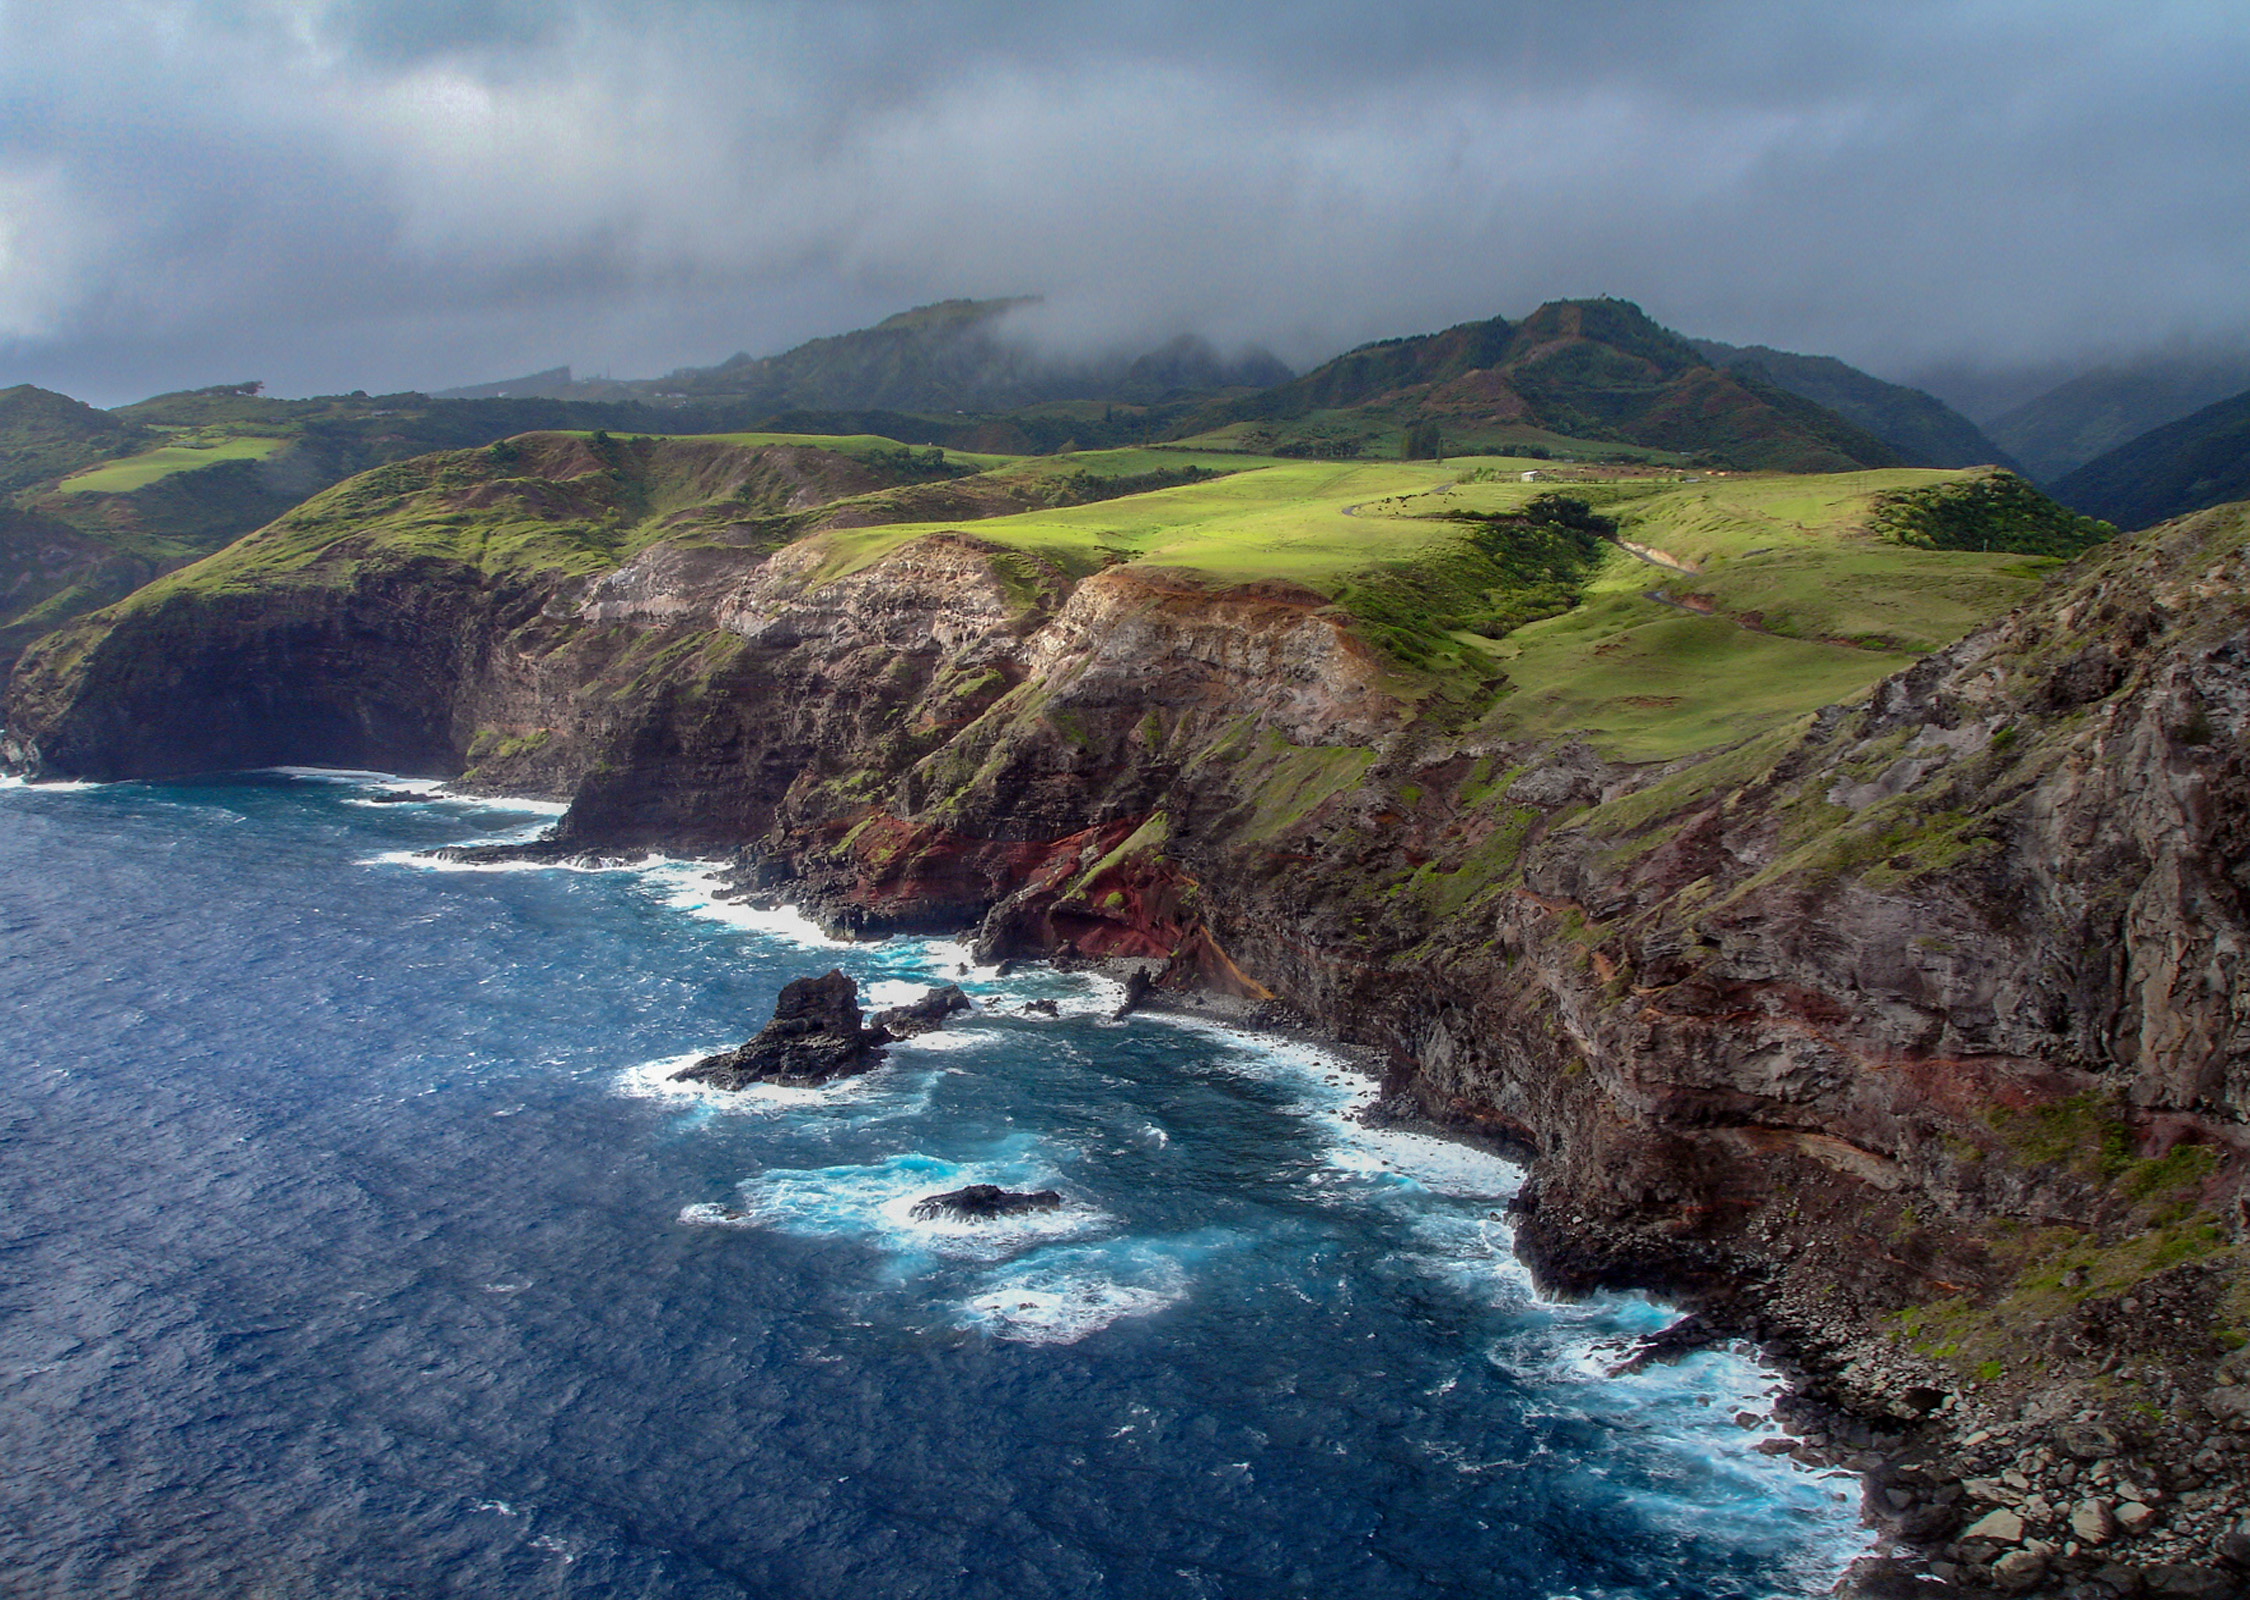 Product West Maui & Molokai Flight